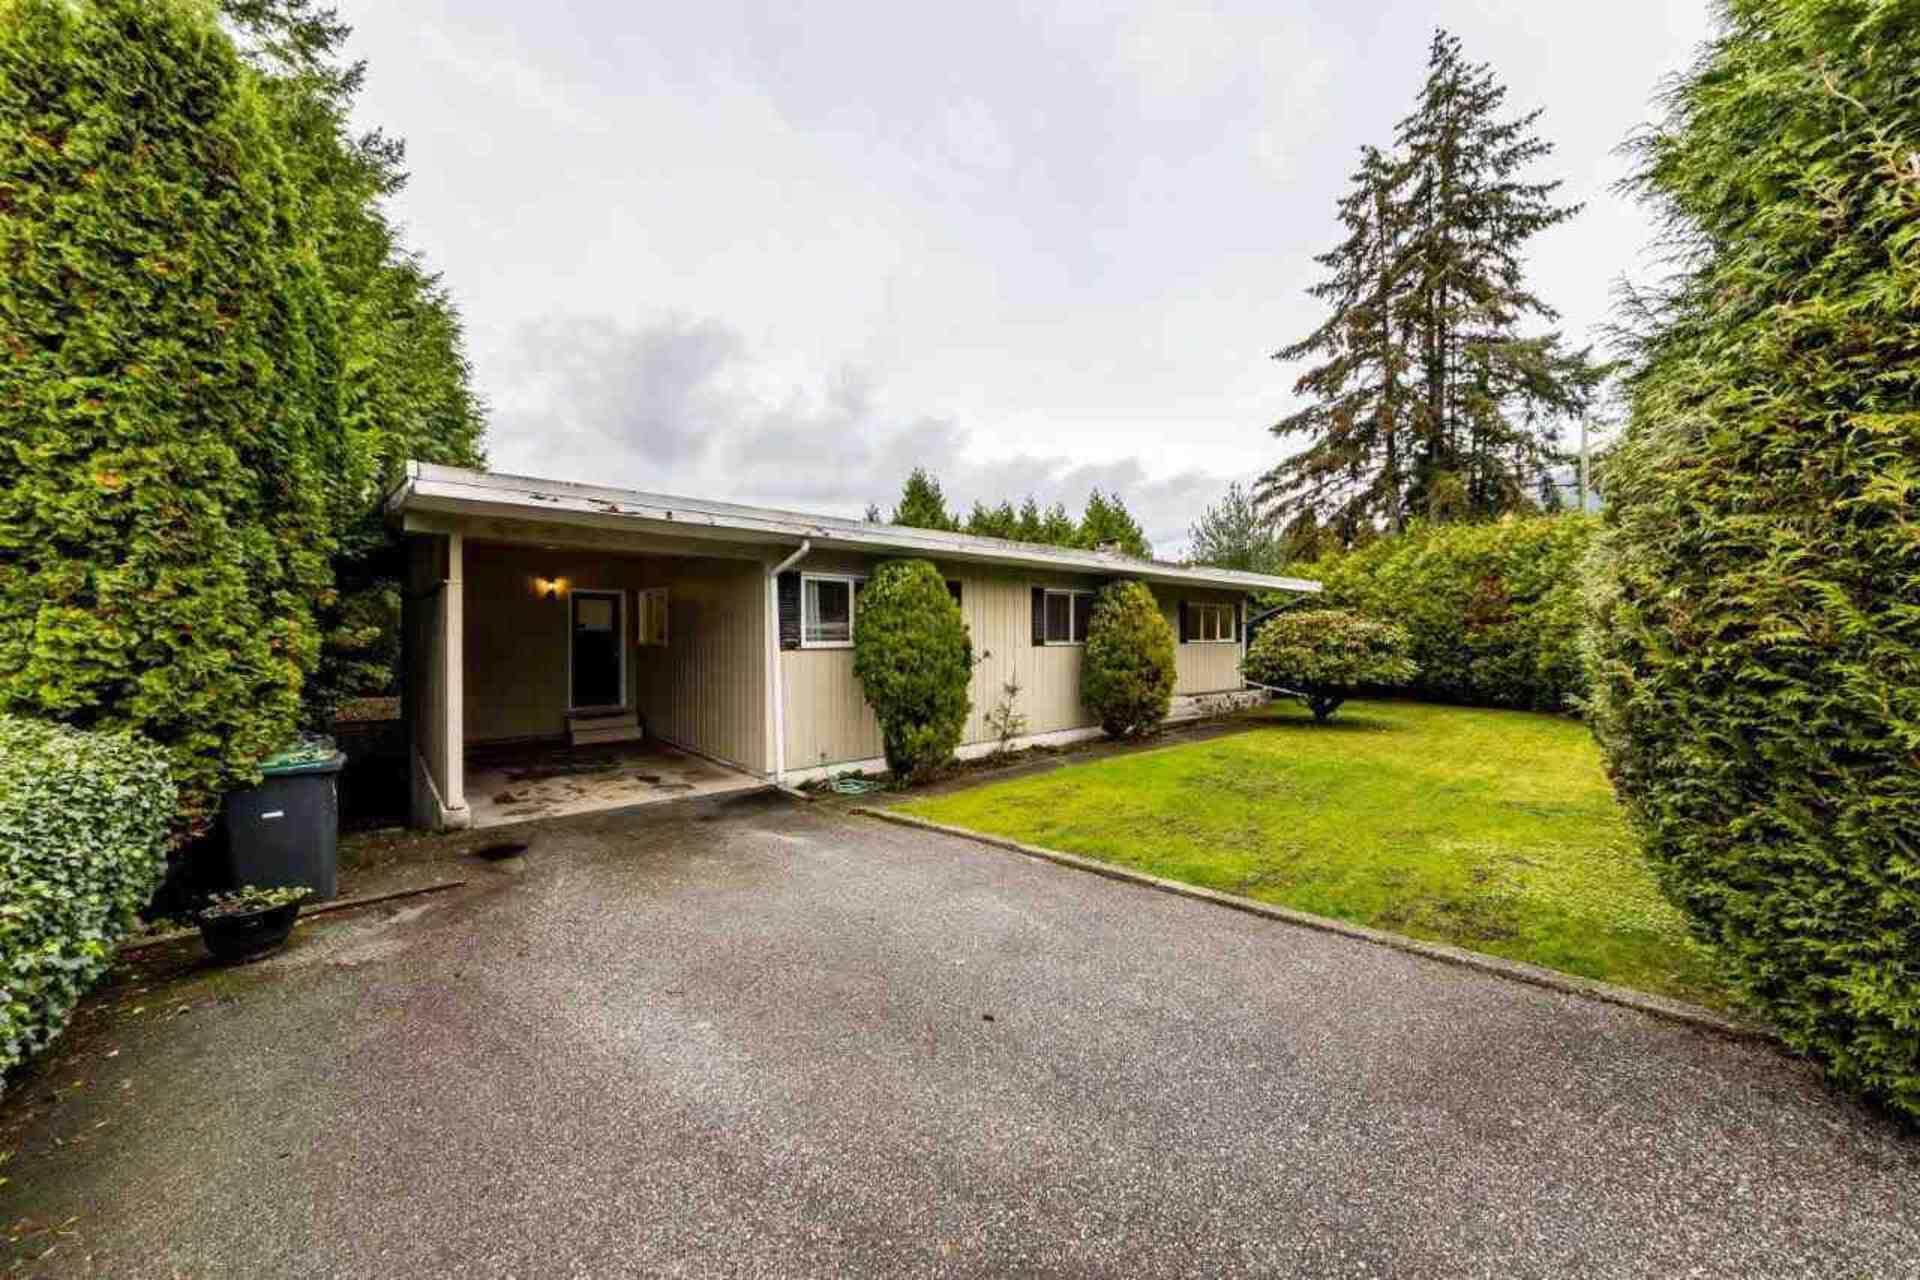 4363-highland-boulevard-forest-hills-nv-north-vancouver-28 at 4363 Highland Boulevard, Forest Hills NV, North Vancouver